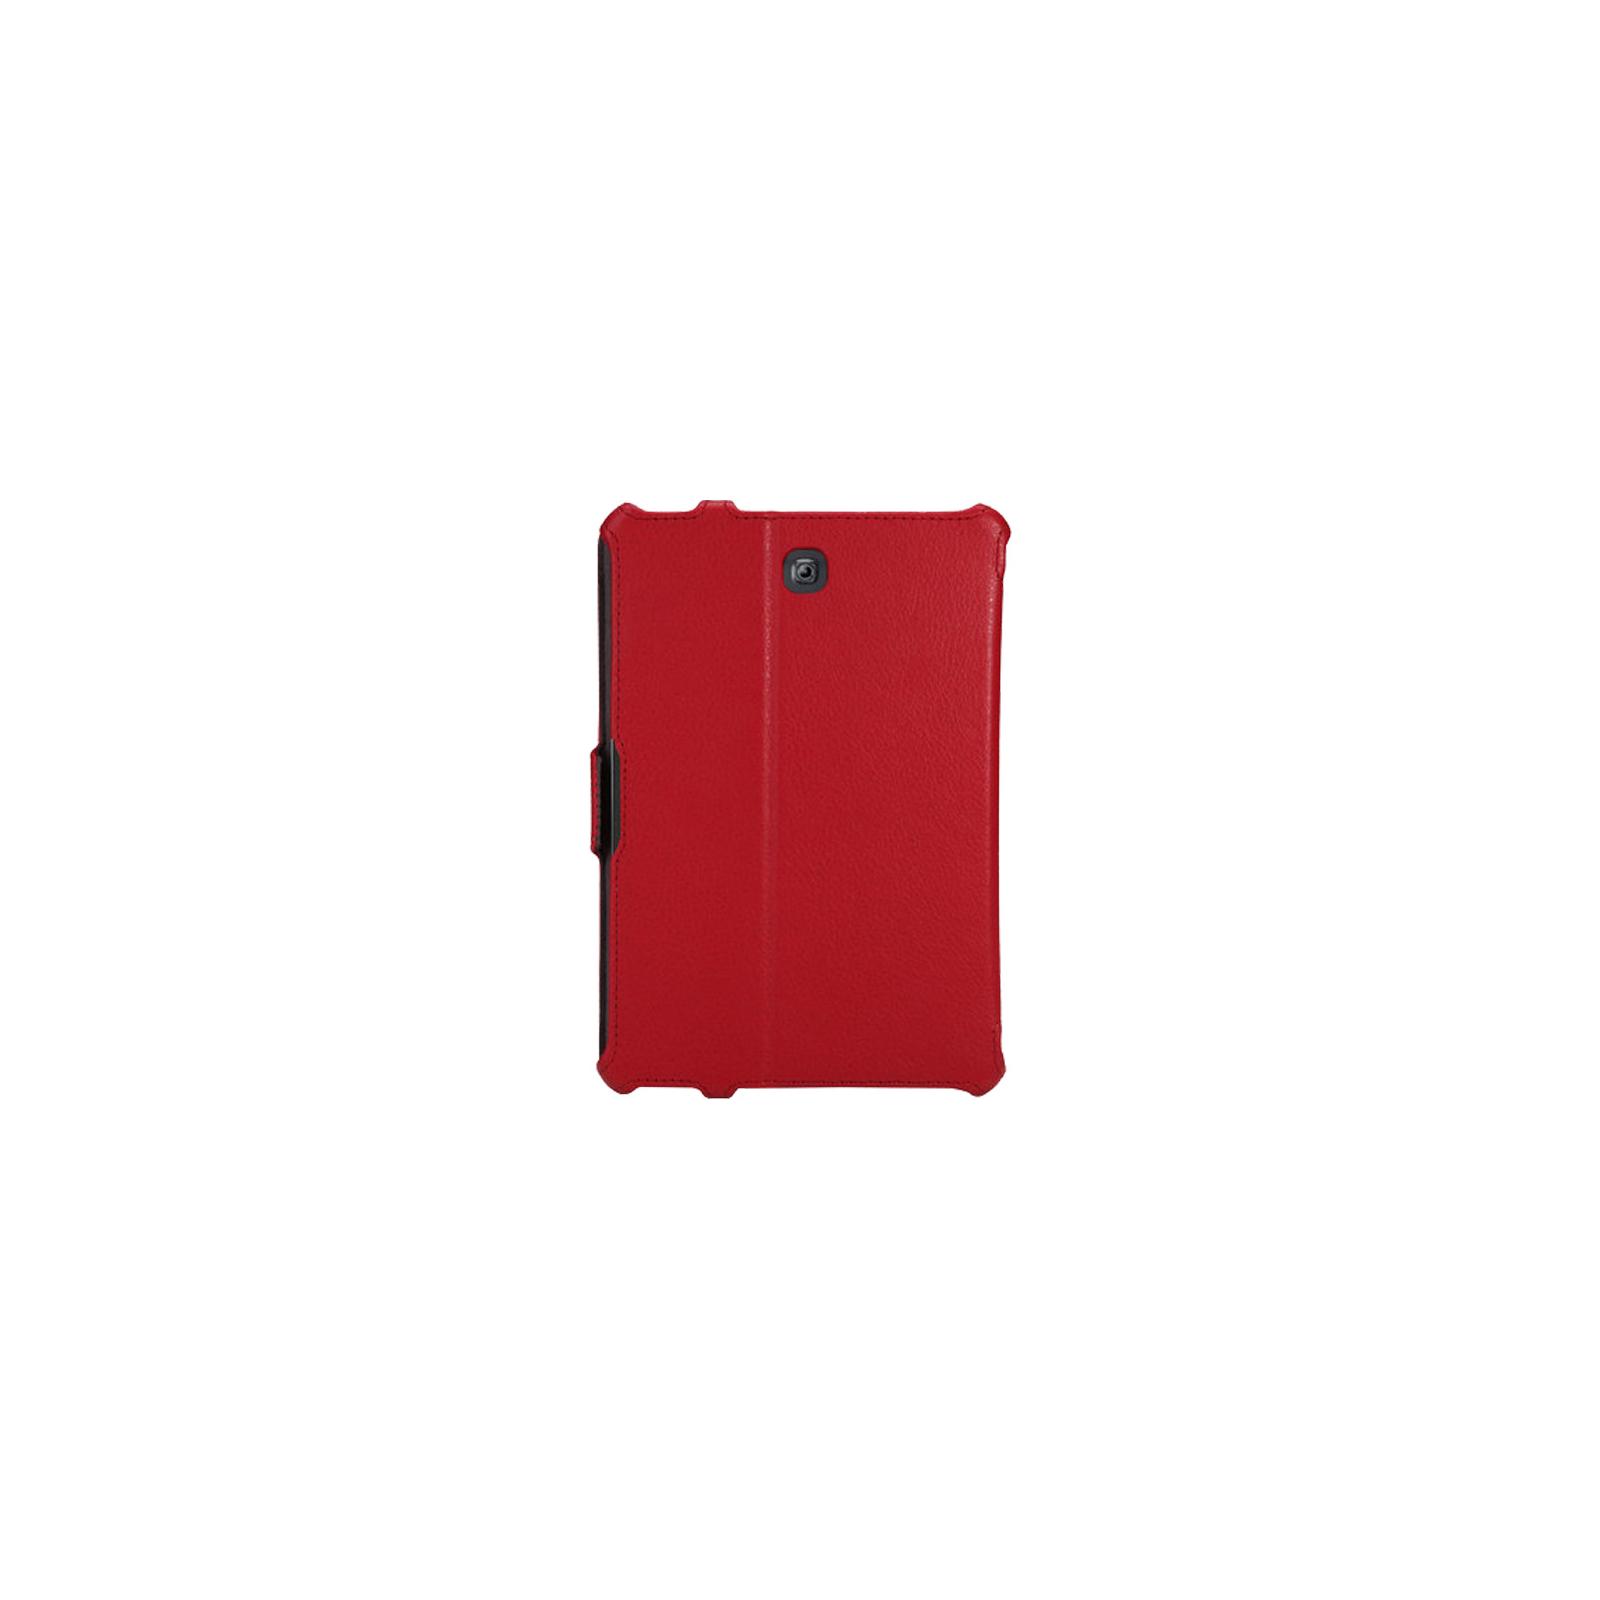 Чехол для планшета AirOn для Samsung Galaxy Tab S 2 8.0 red (4822352777524) изображение 2